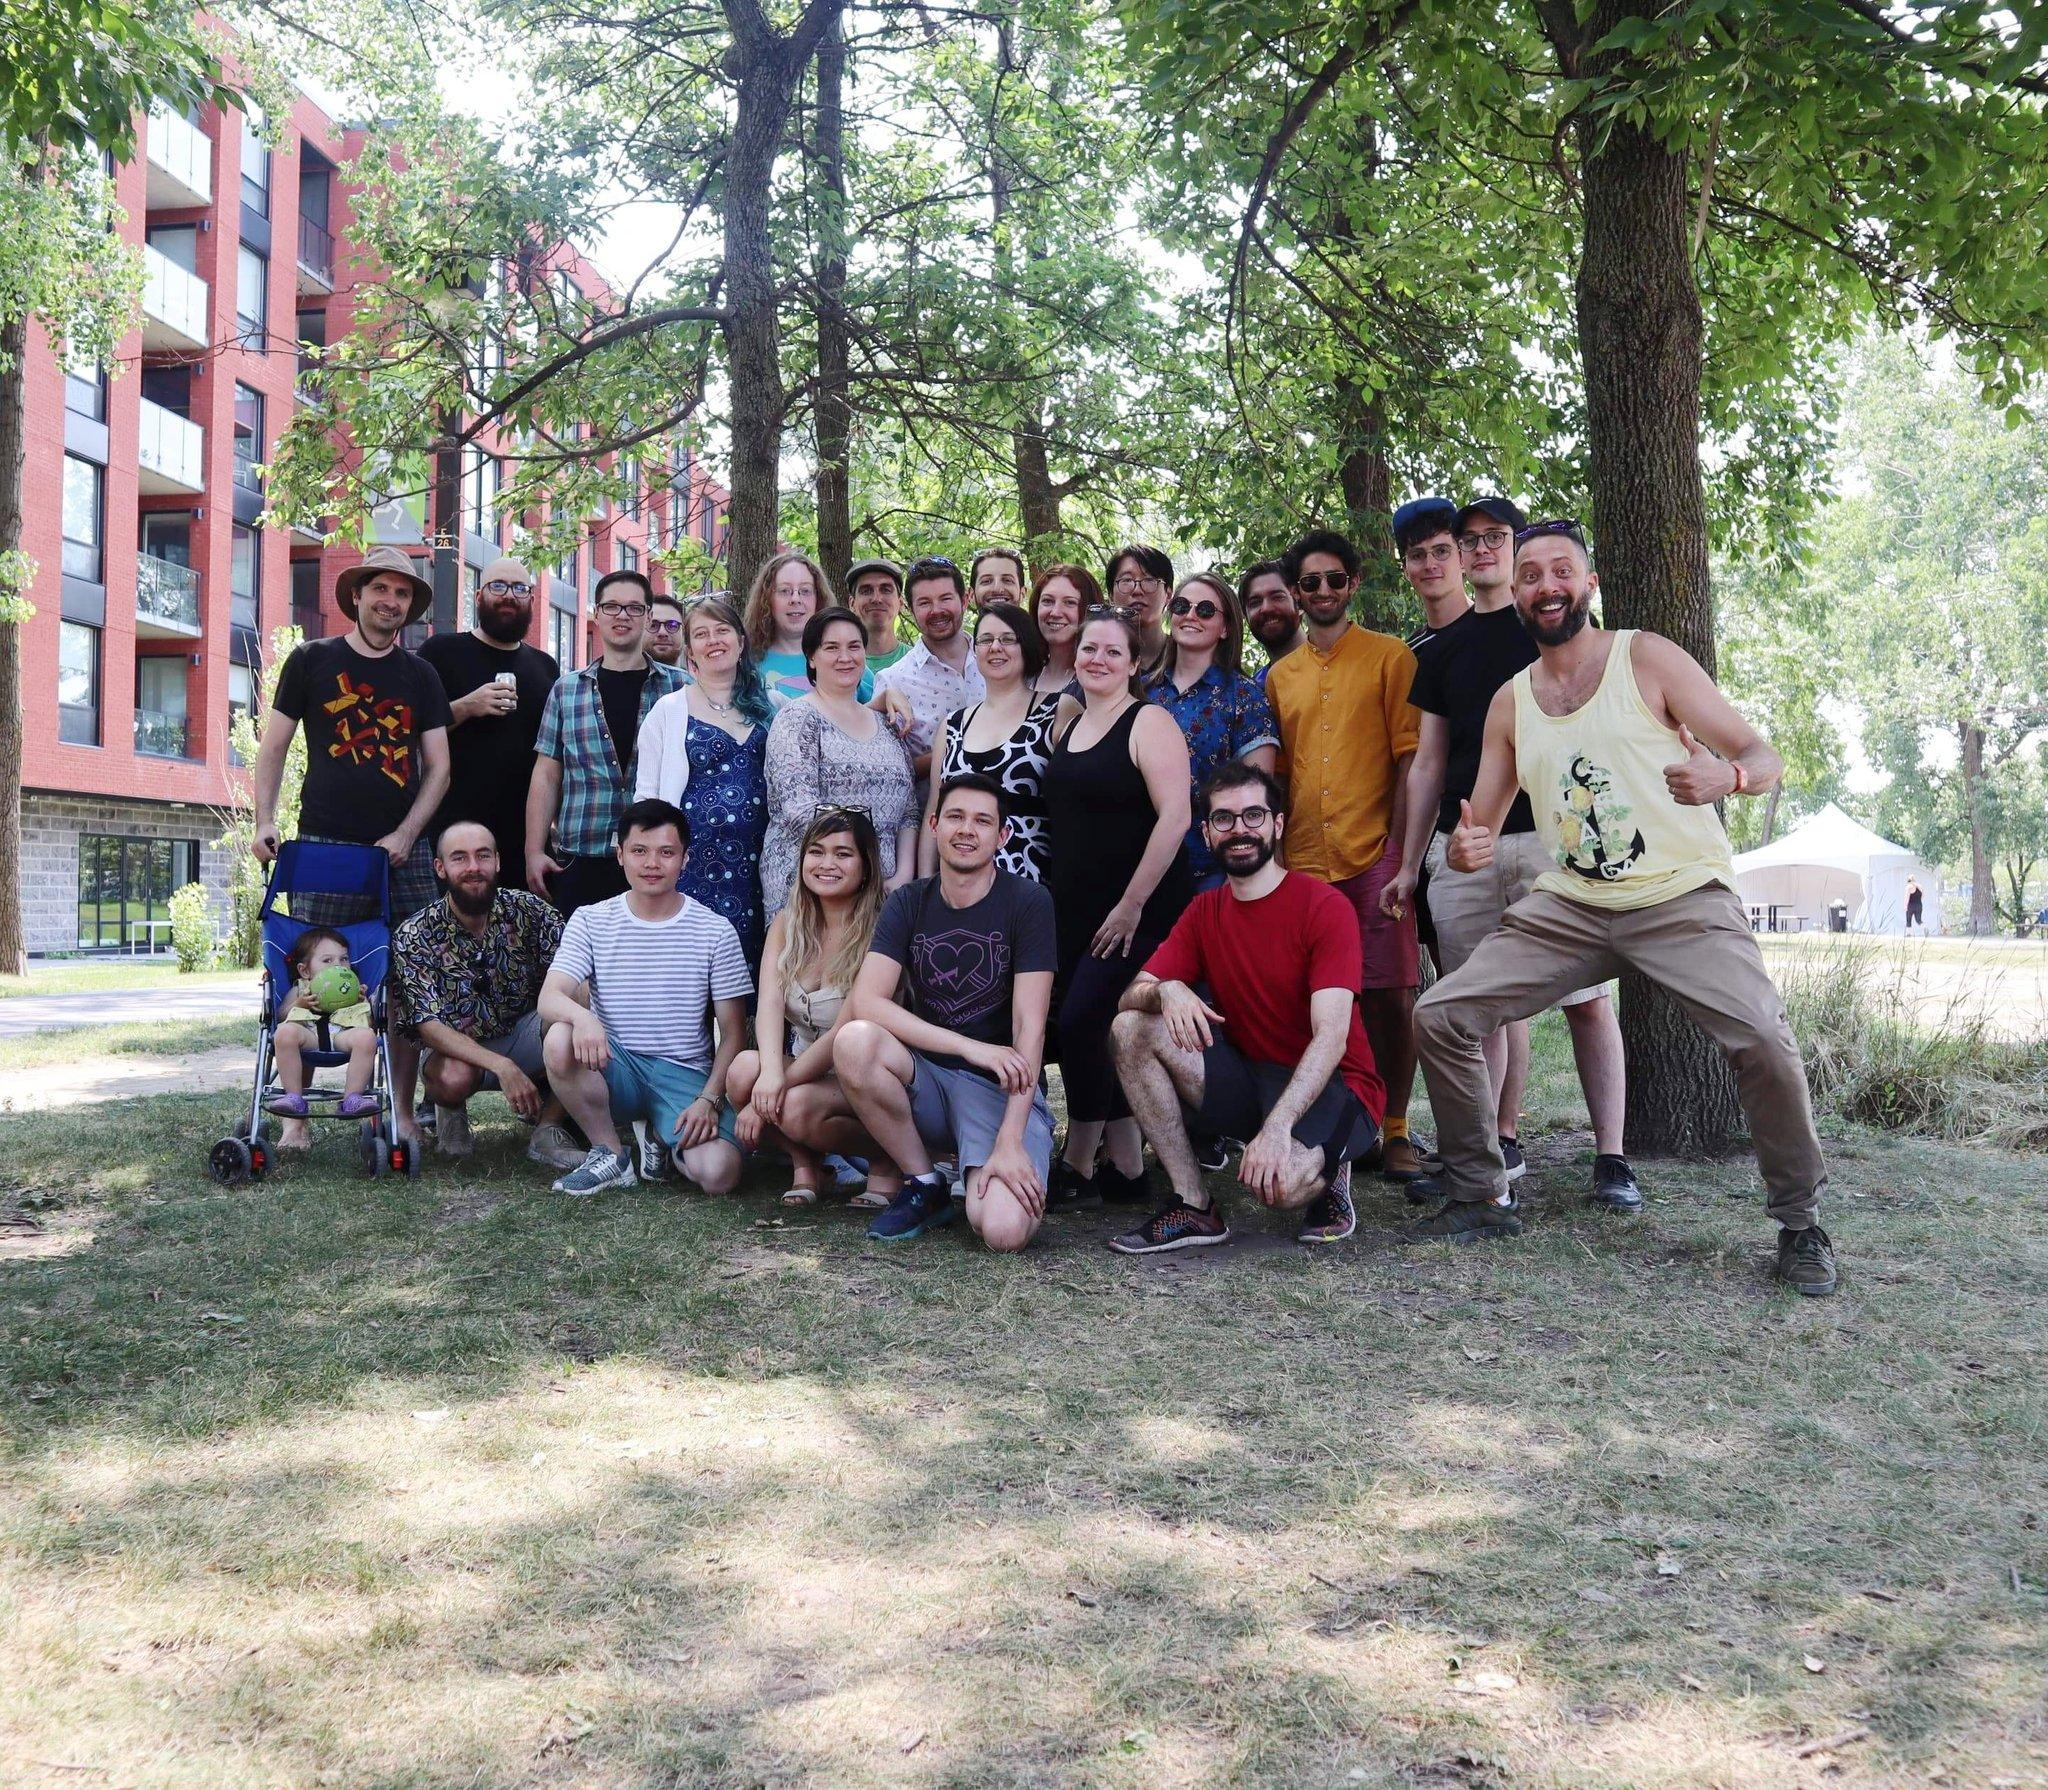 2019-07-29 Kitfox Picnic 1.jpg